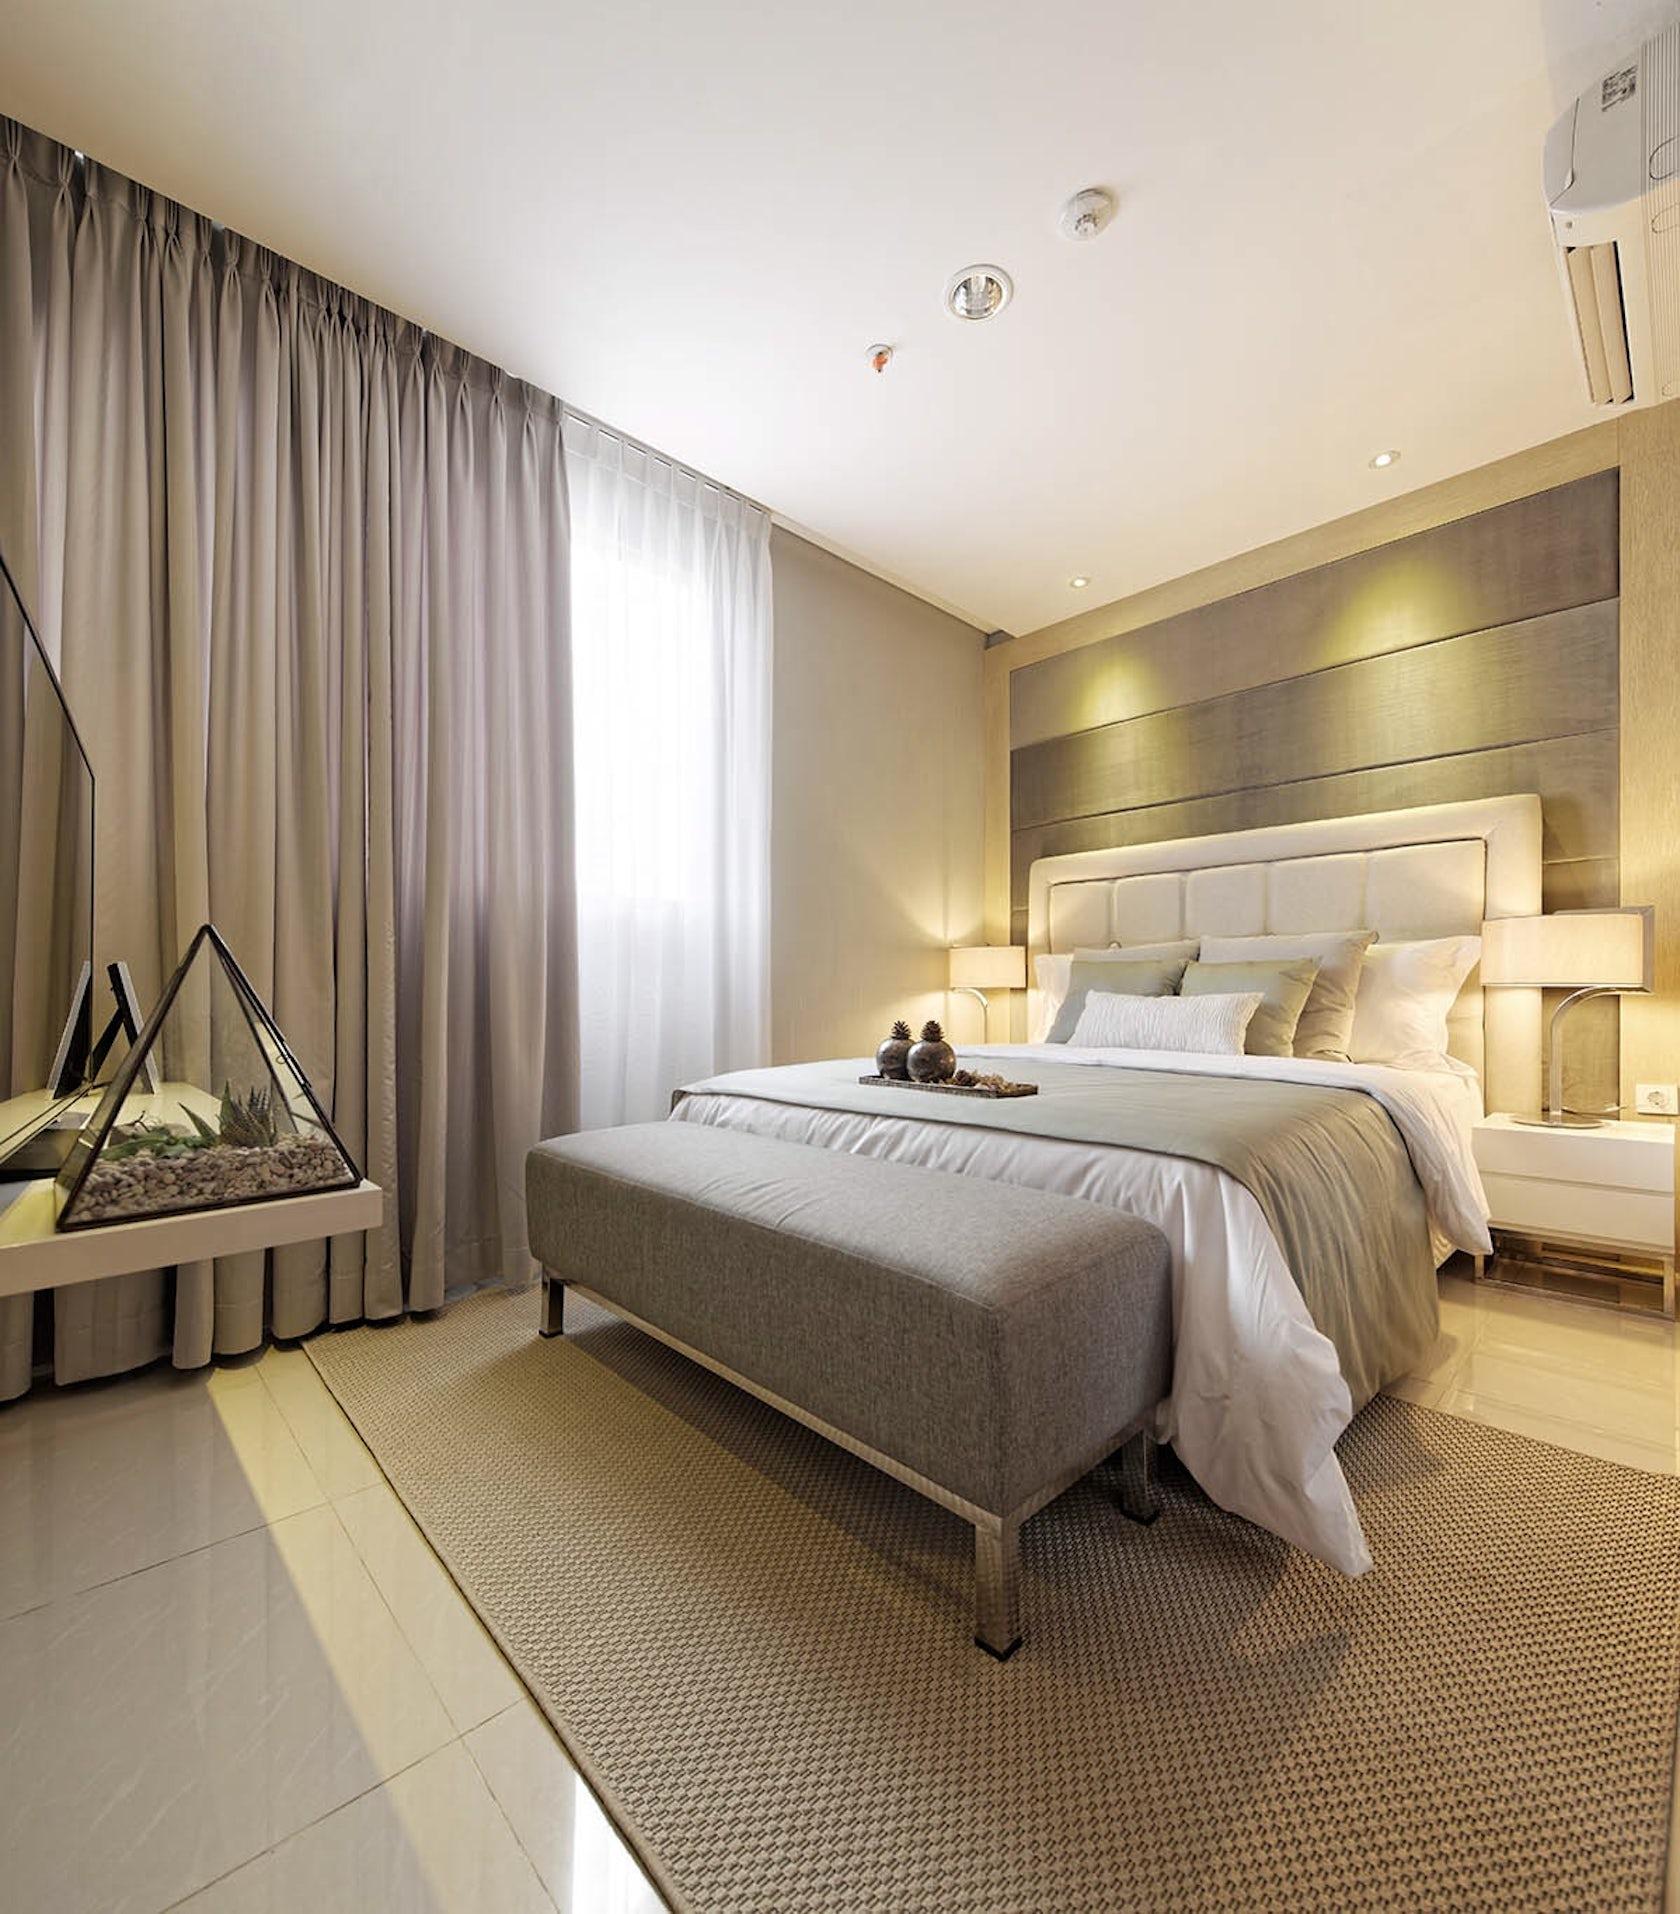 Apartment Unit: Show Unit 2 Bedroom Paddington Height Apartment